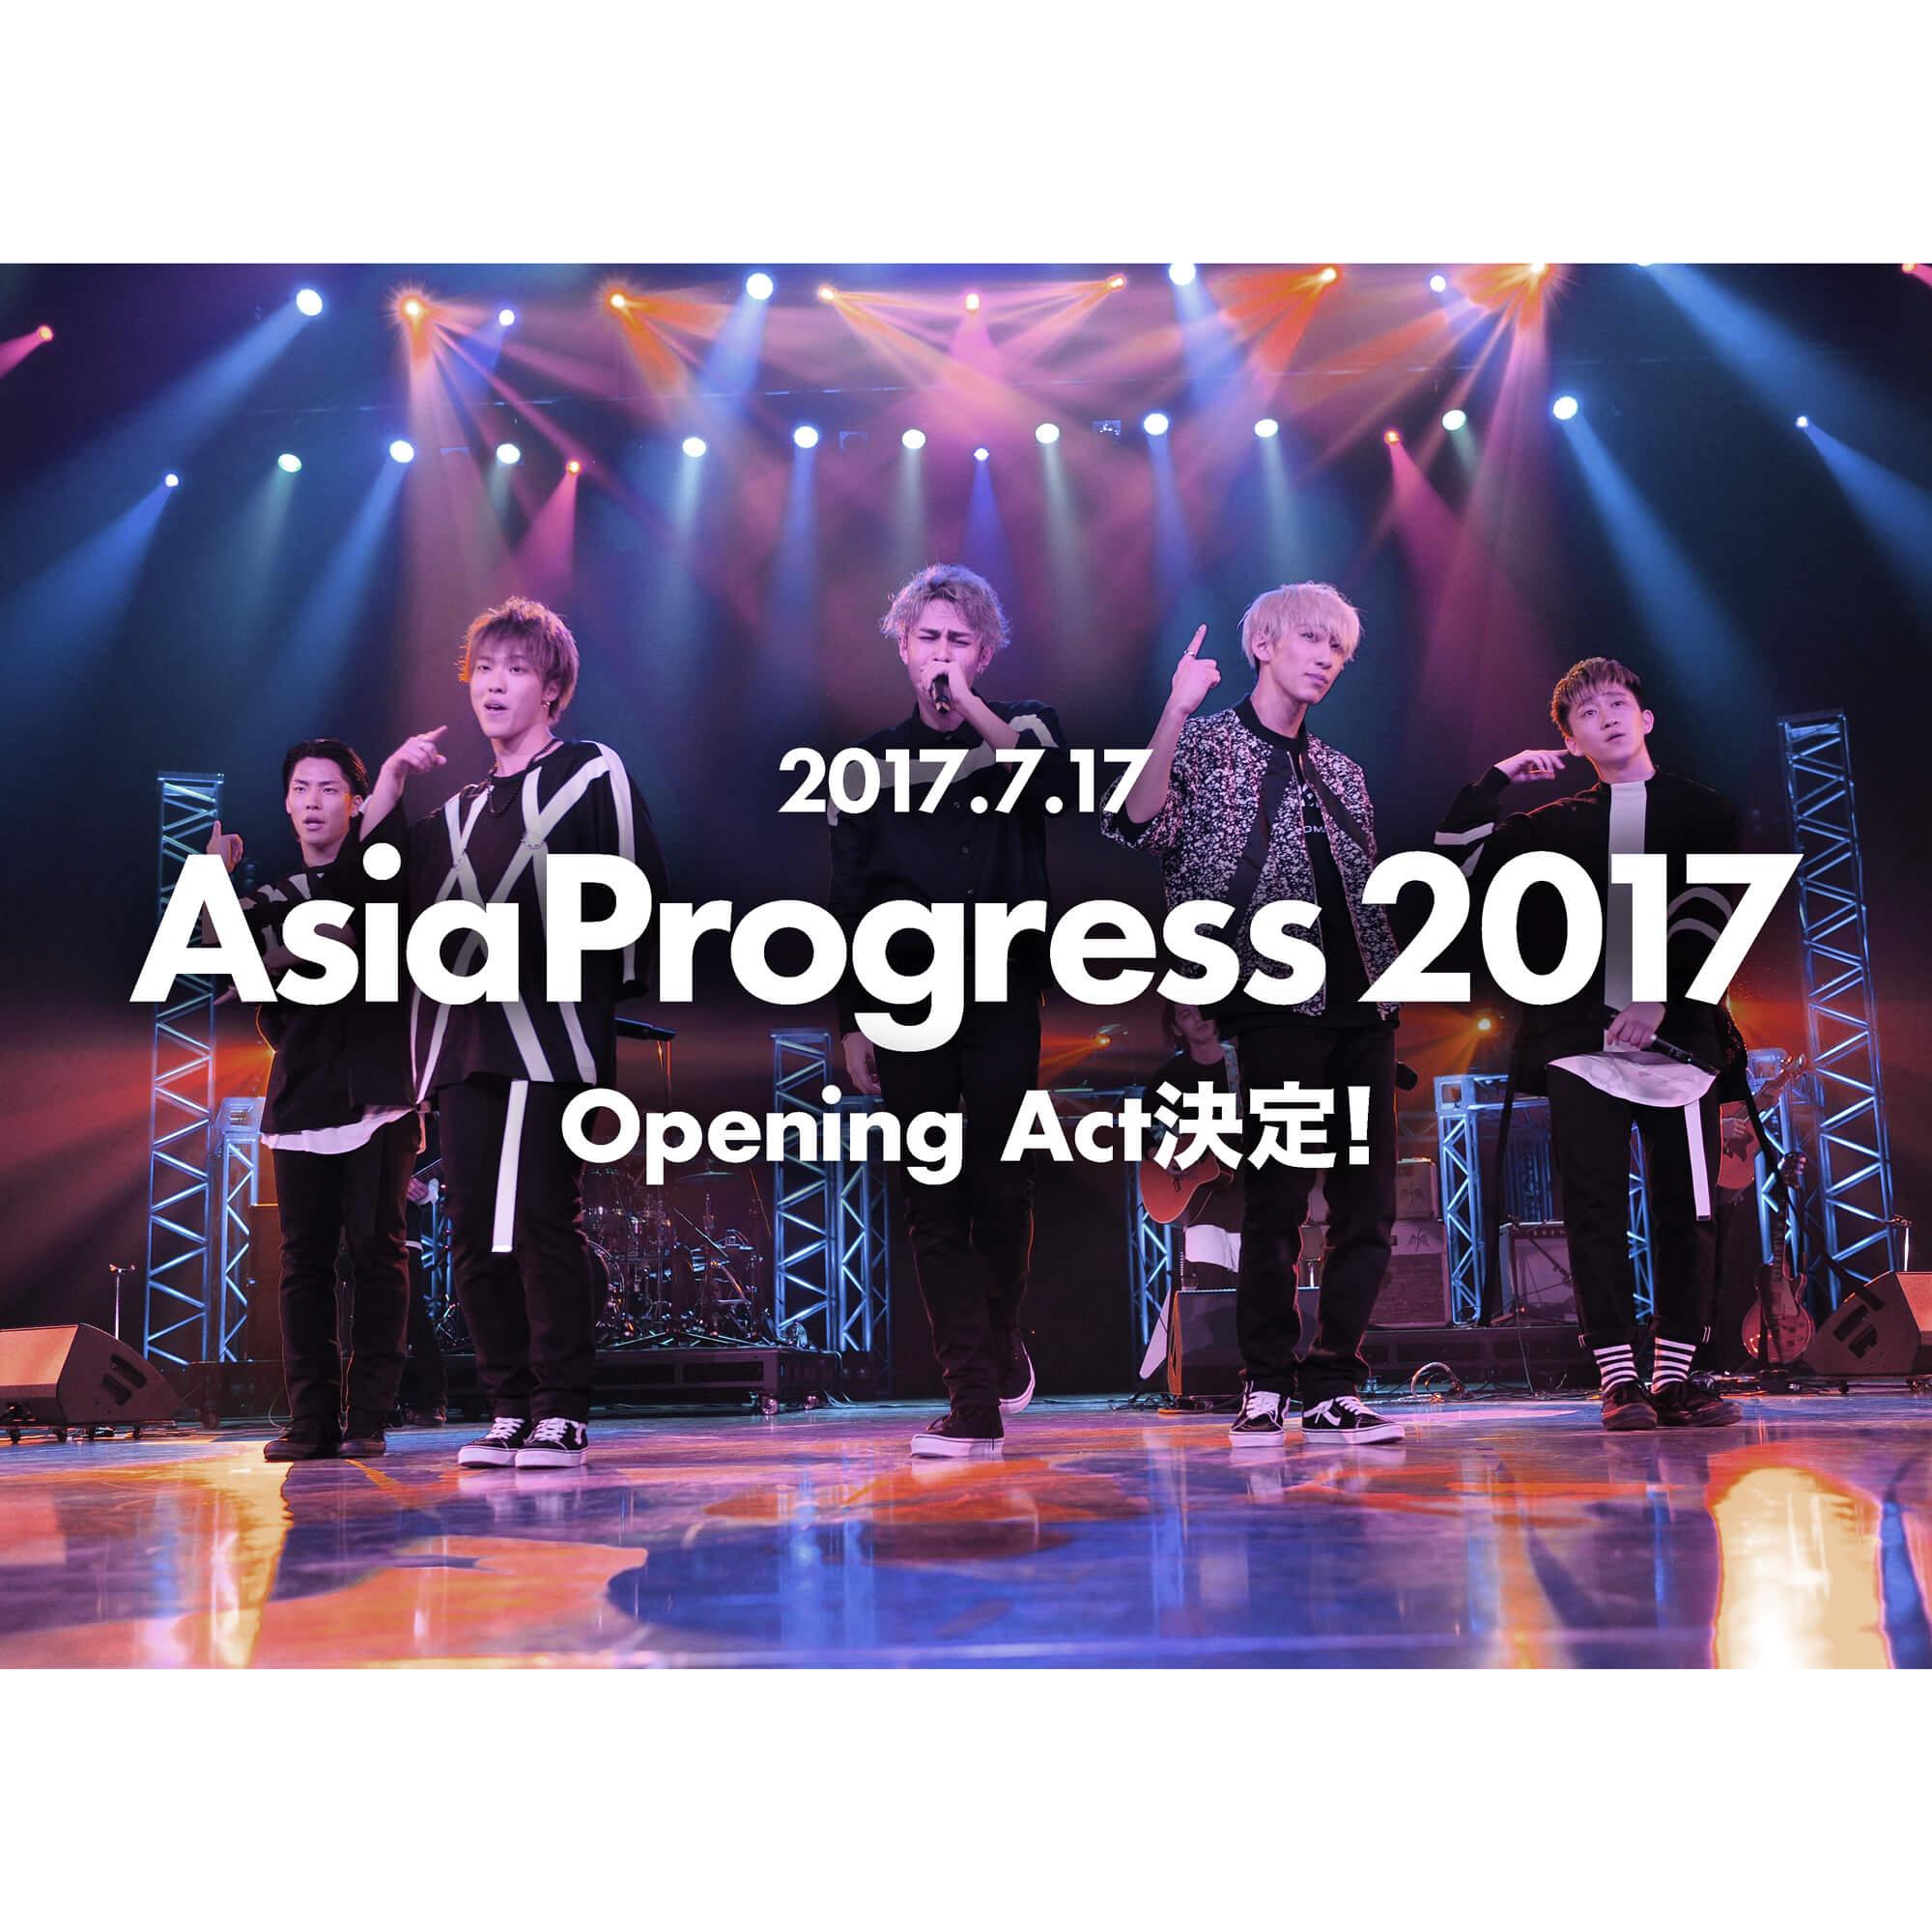 「AsiaProgress 2017」出演決定!